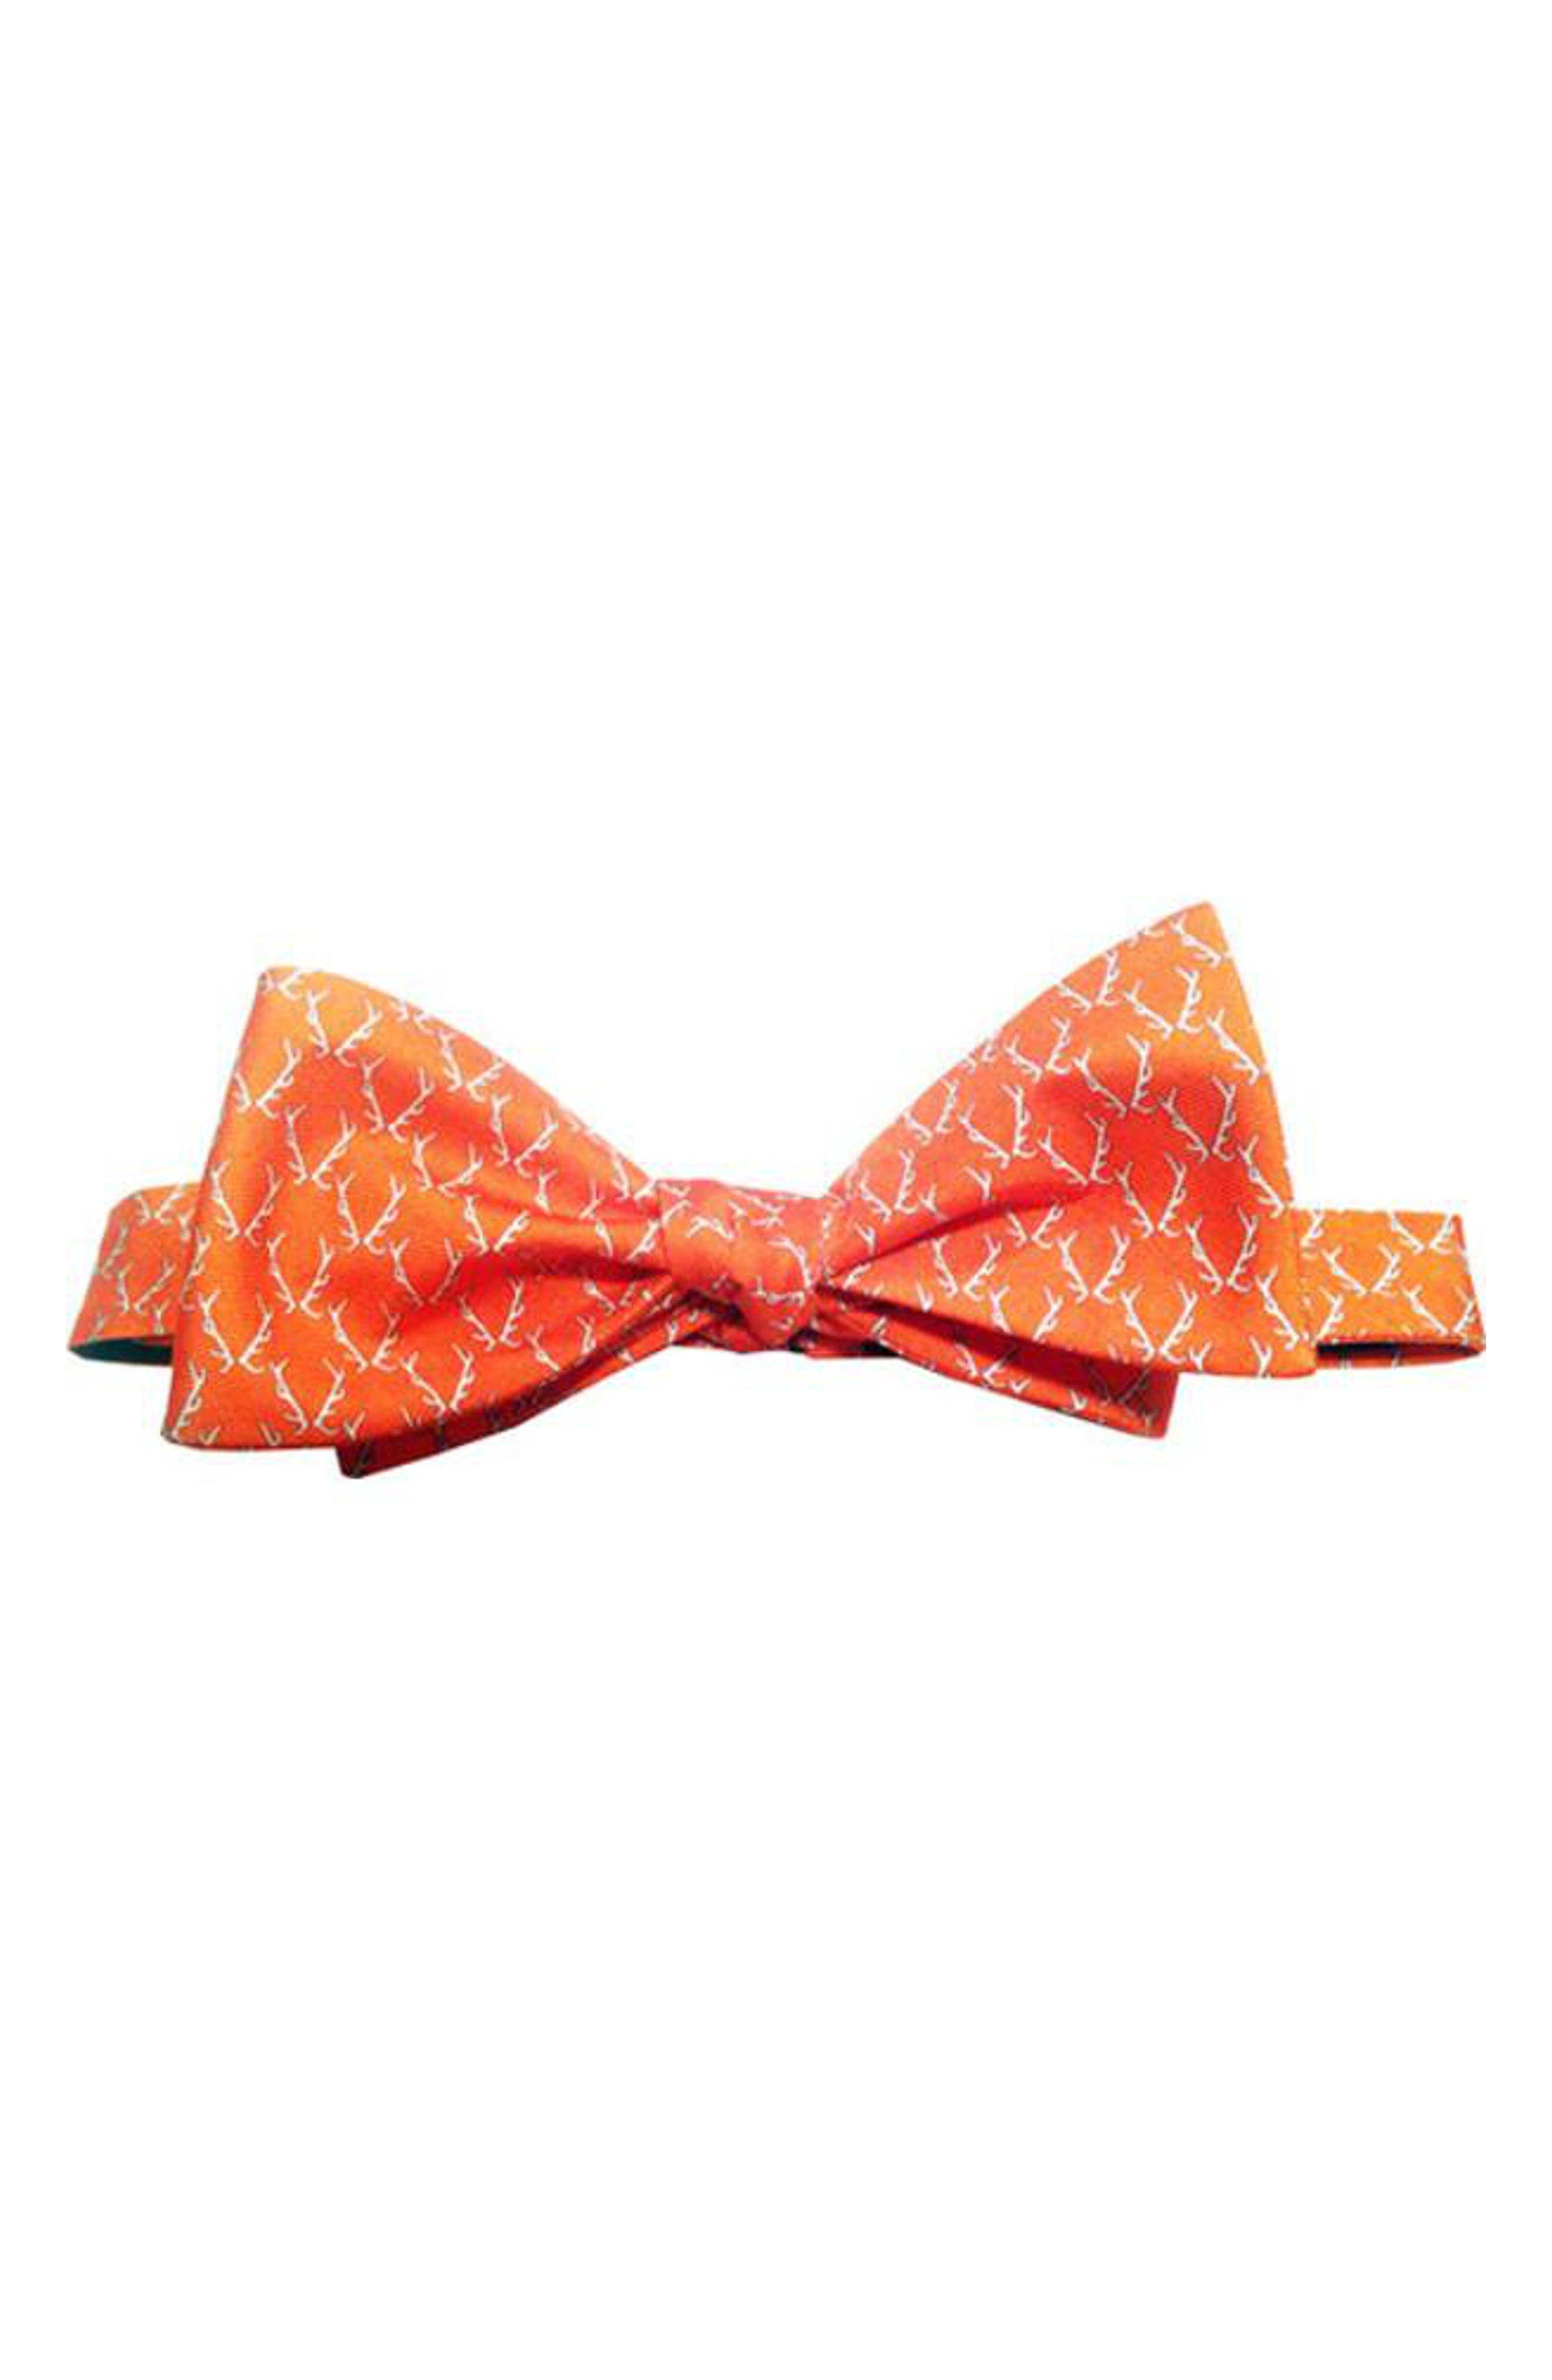 Buckwild Silk Bow Tie,                         Main,                         color, Orange